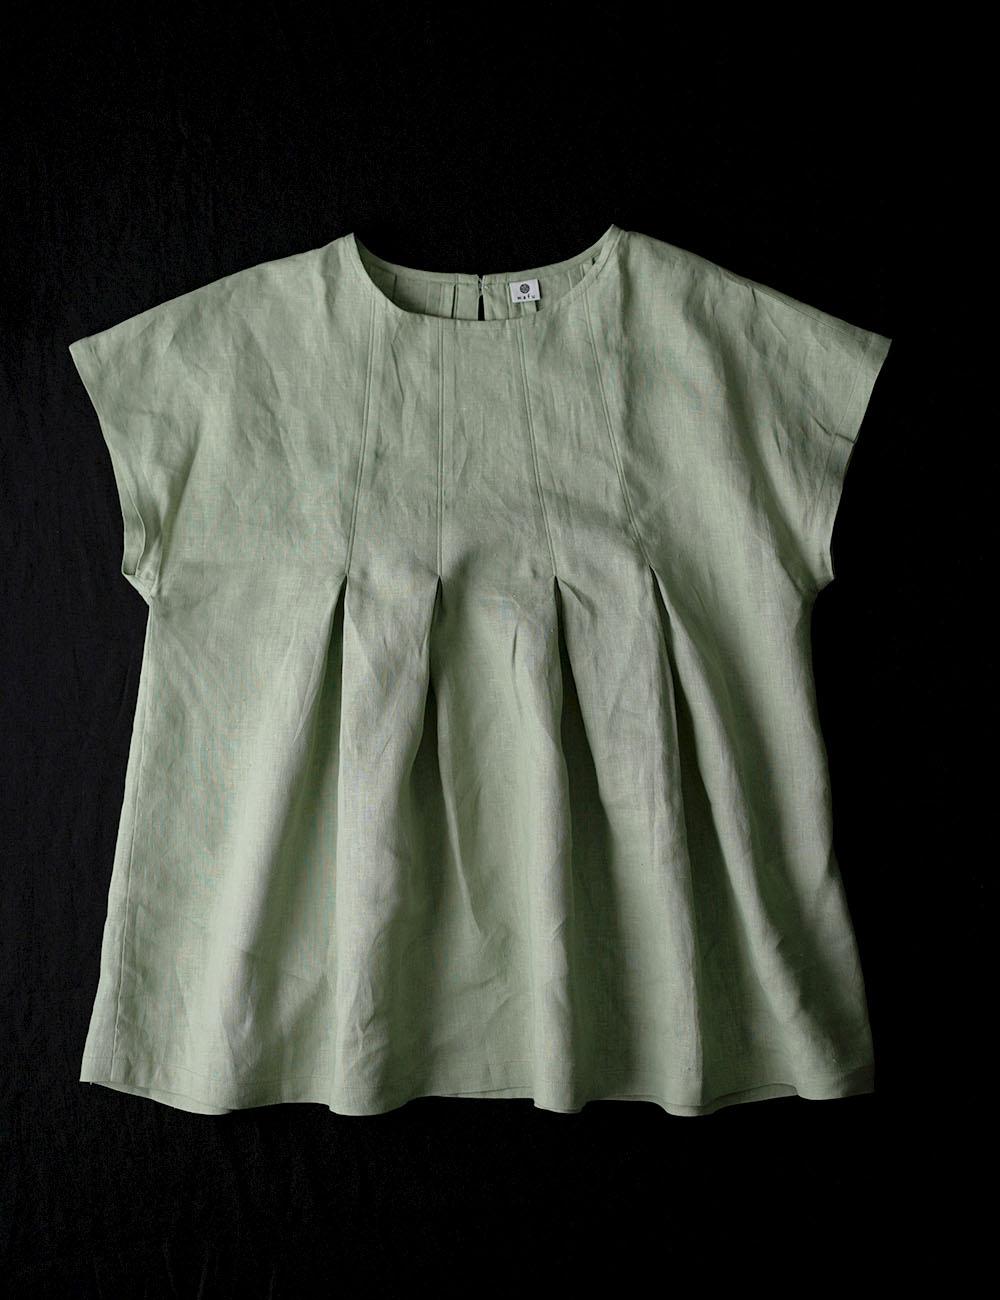 【wafu】雅亜麻 Double-pleated blouse 2重ヒダのリネンブラウス 薄地 / 萌黄(もえぎ) t039a-meg1